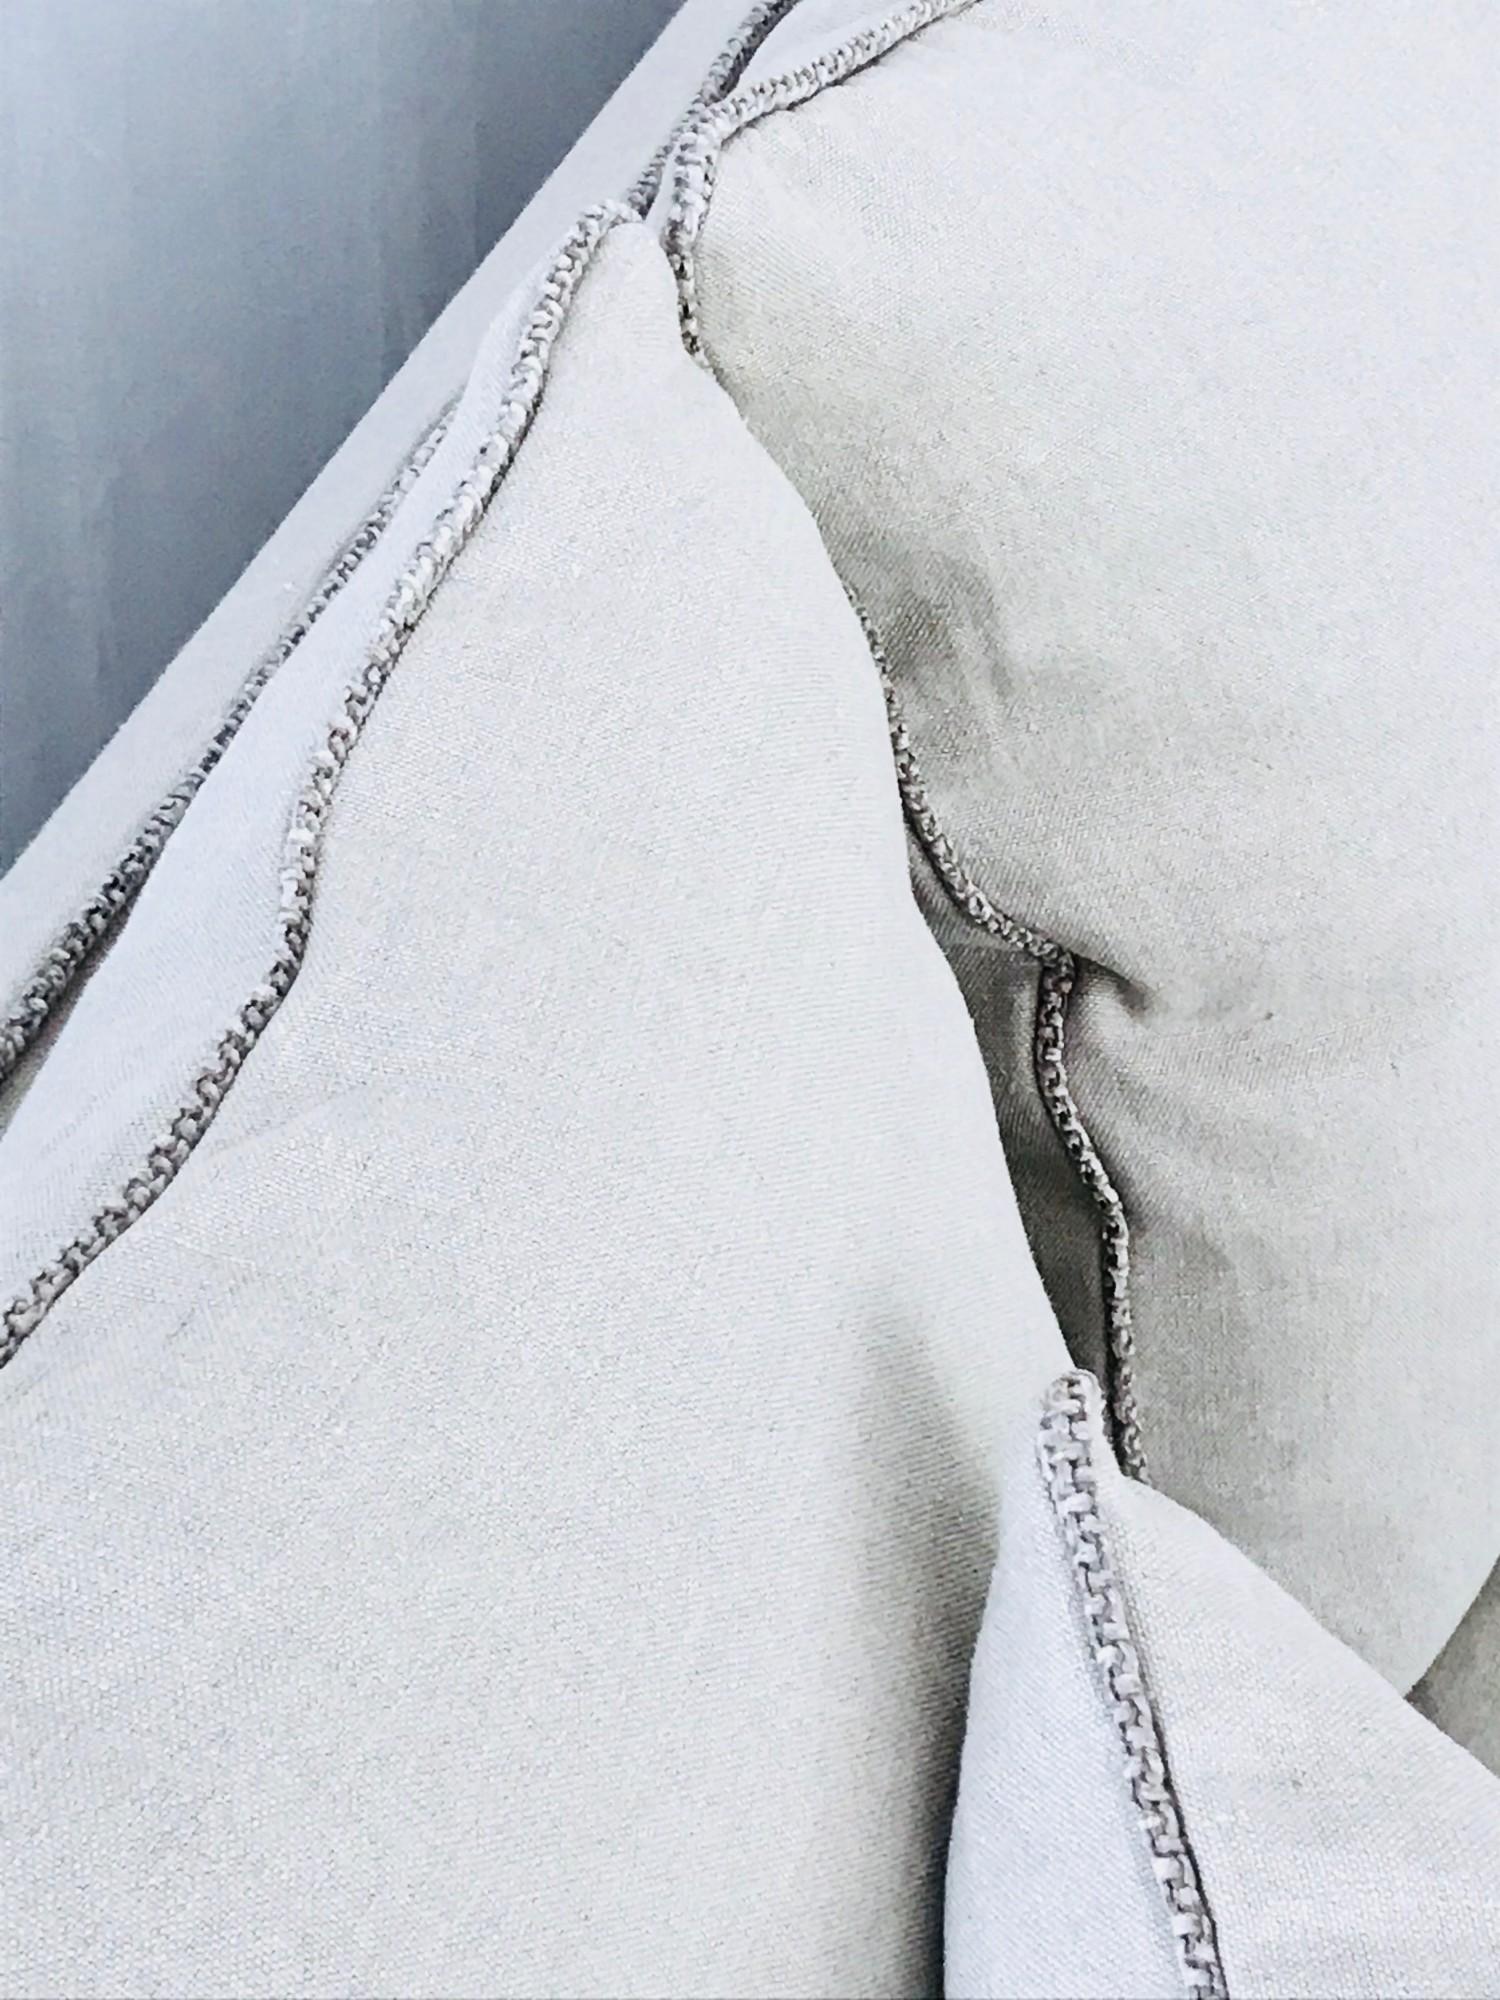 Canapé Mila lin lavé beige ficelle finition liseret chenille soft washed Zahara